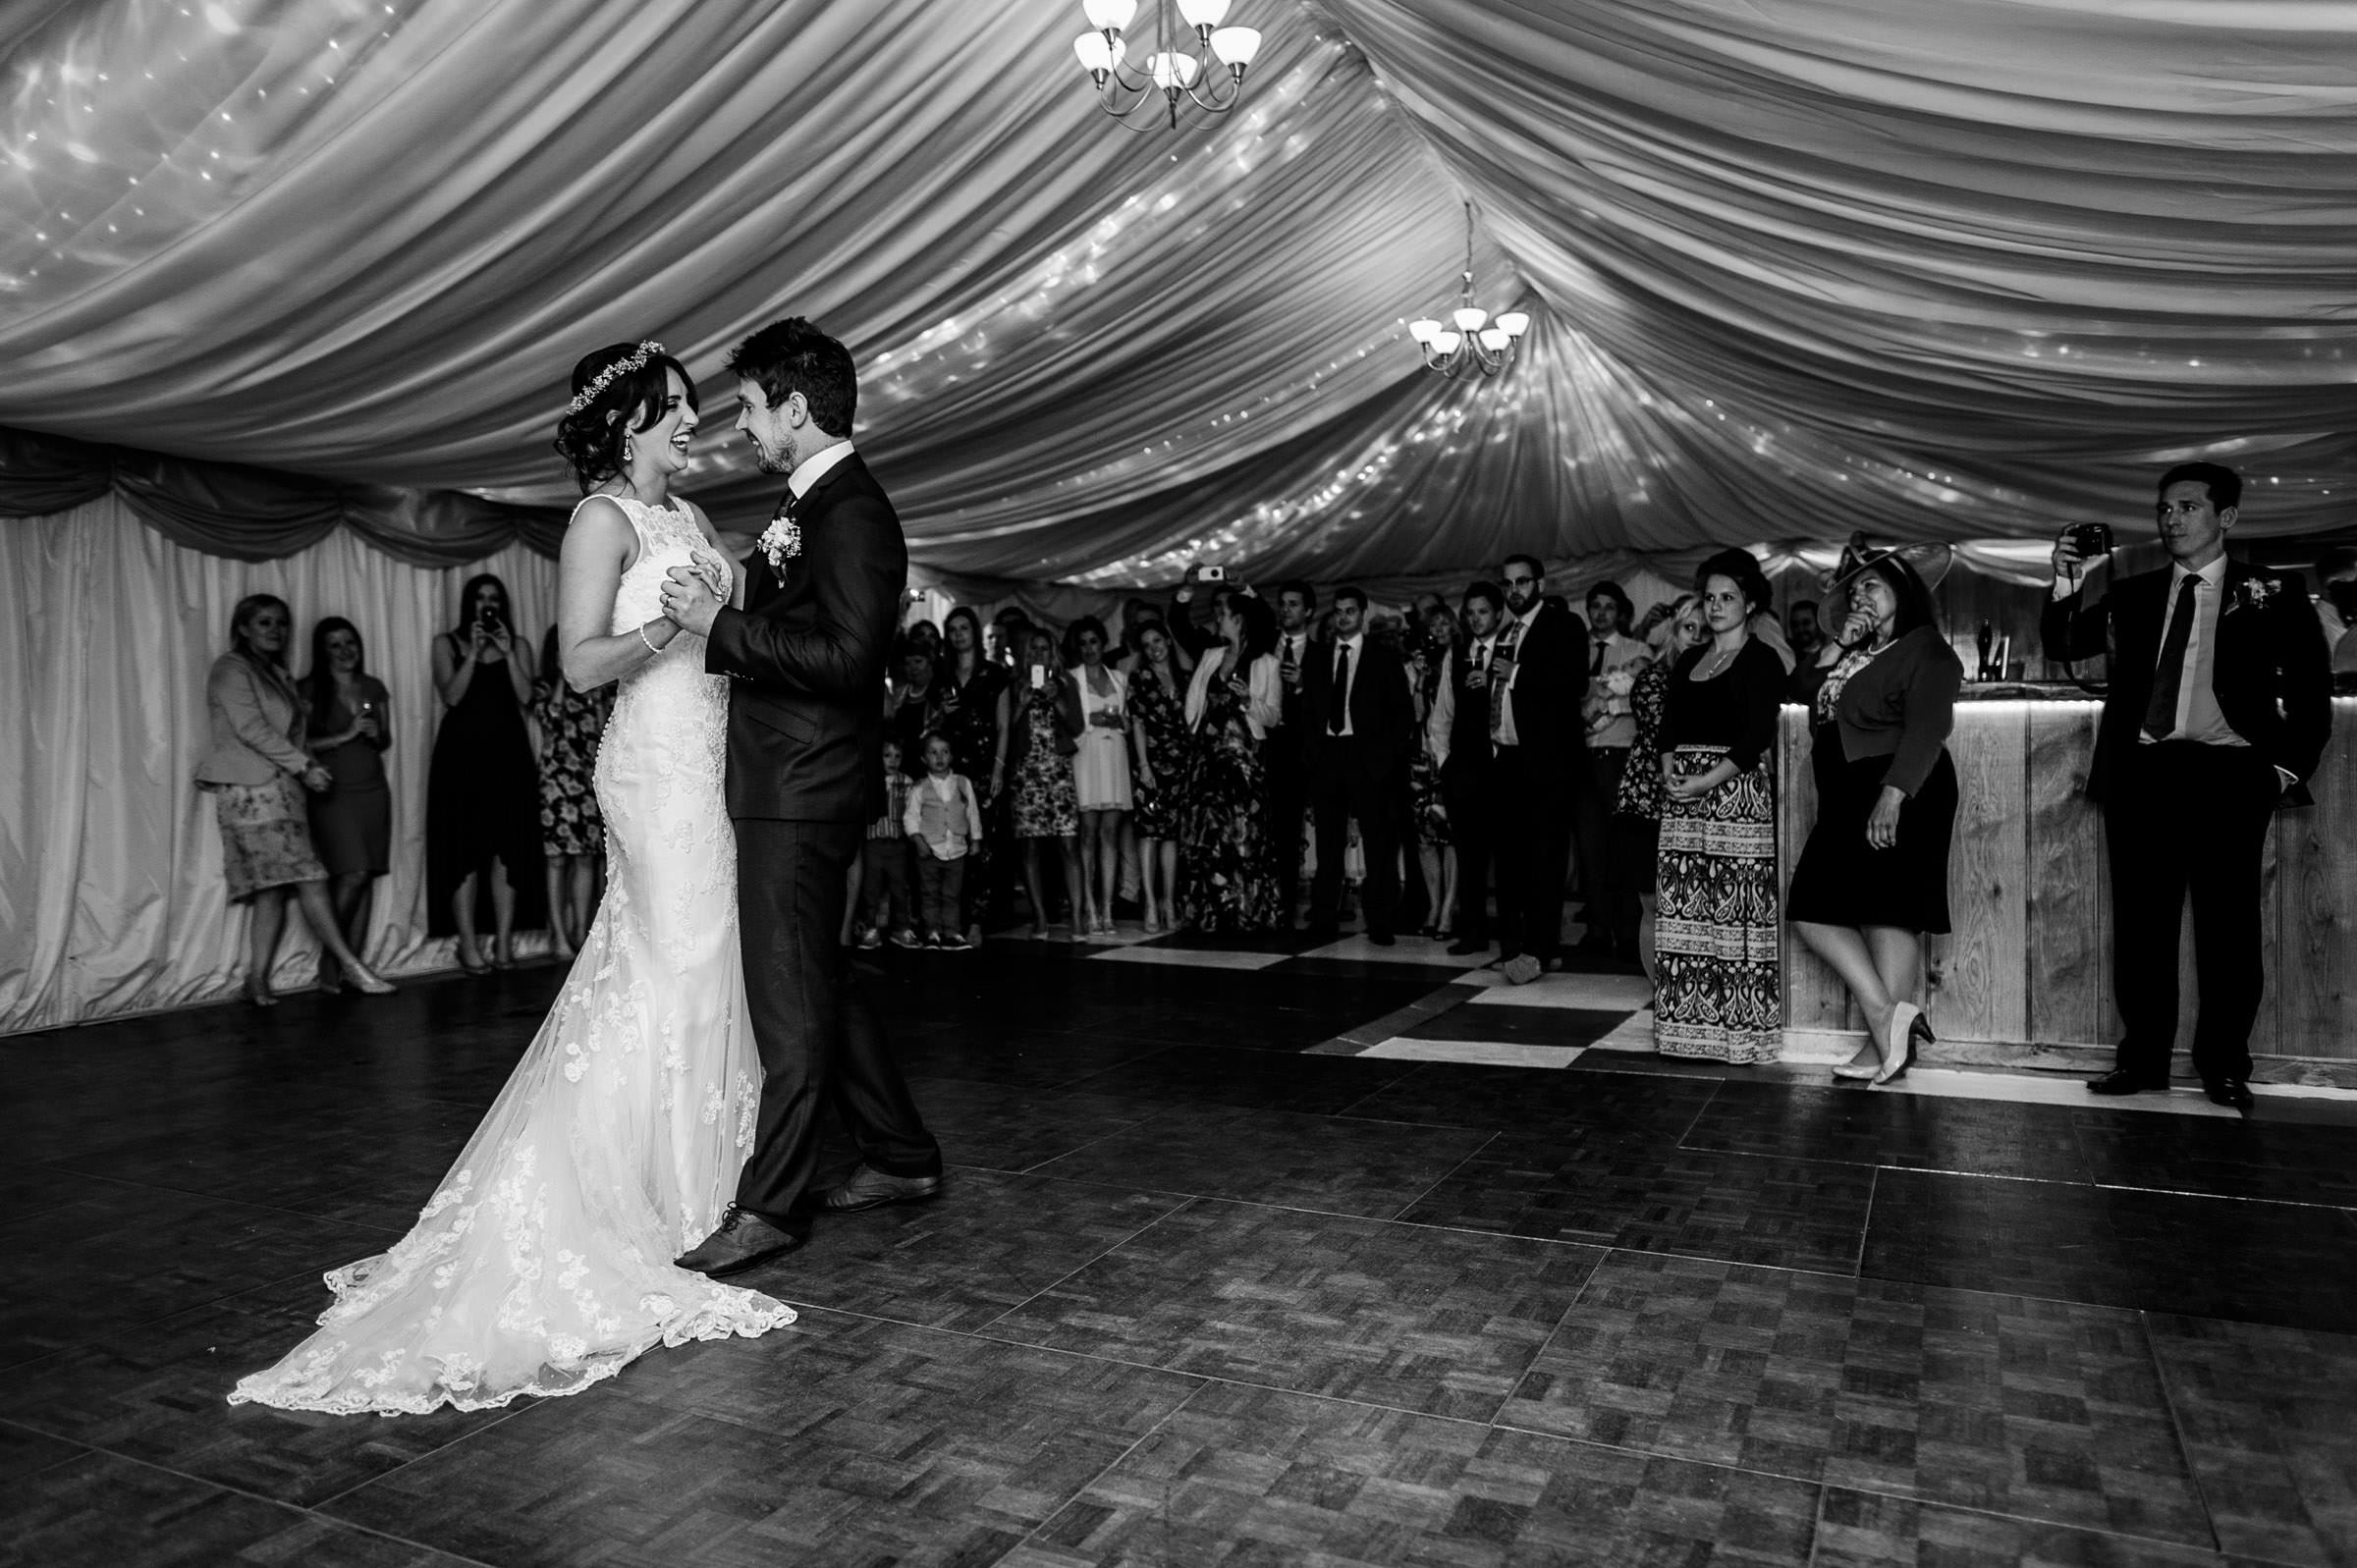 Notley Tythe Barn Reportage Wedding Photos 038.jpg